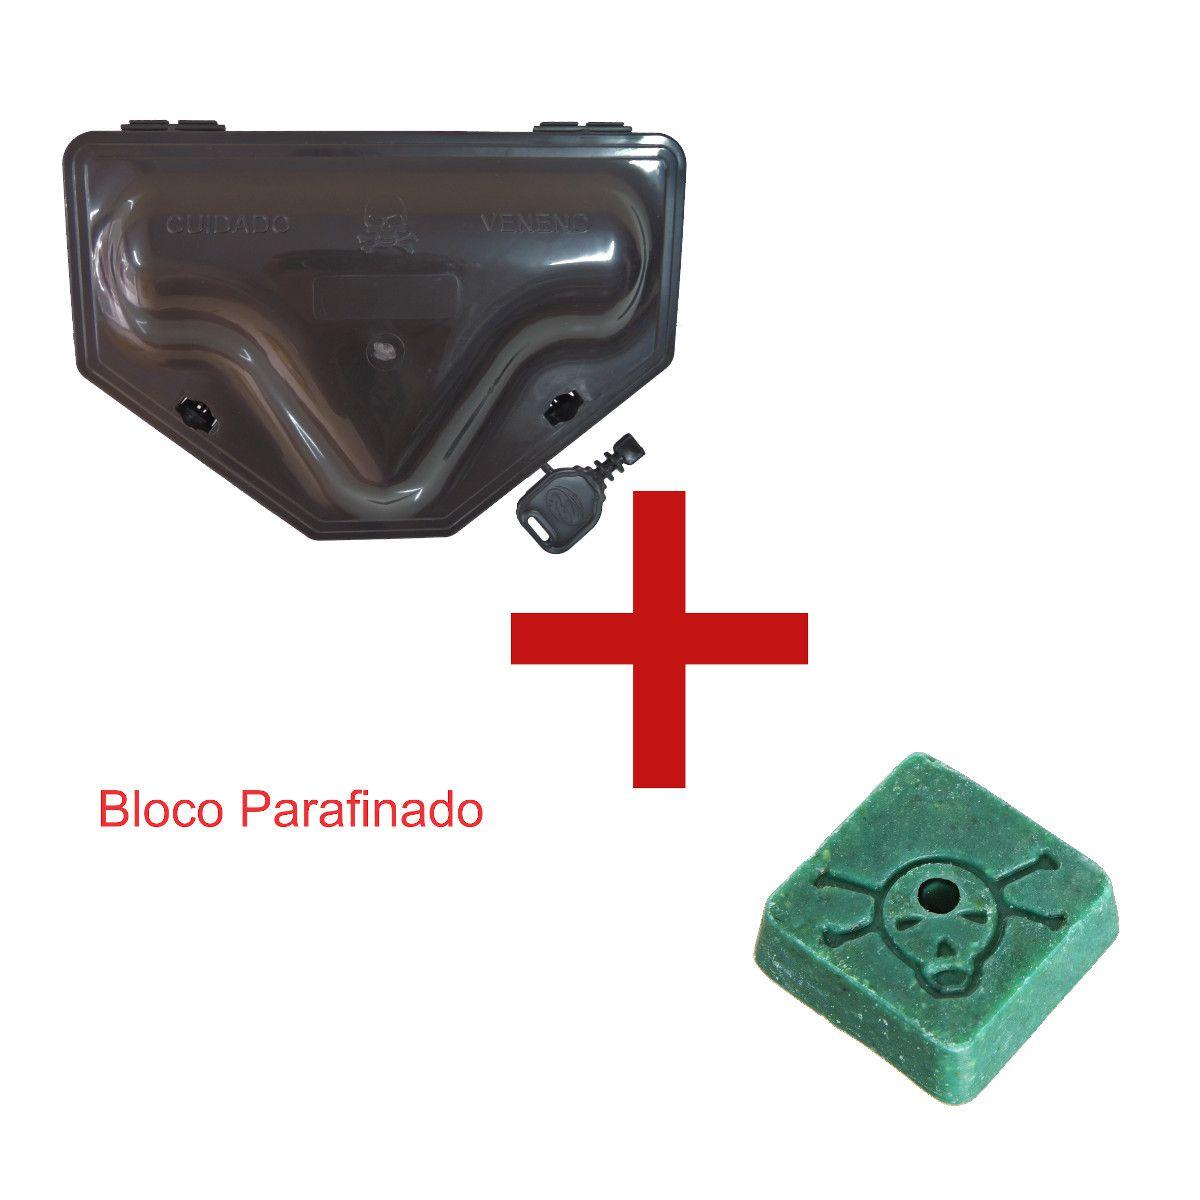 KIT 700 Armadilha Pega Rato Porta Iscas Forte 2 TRAVAS Chave